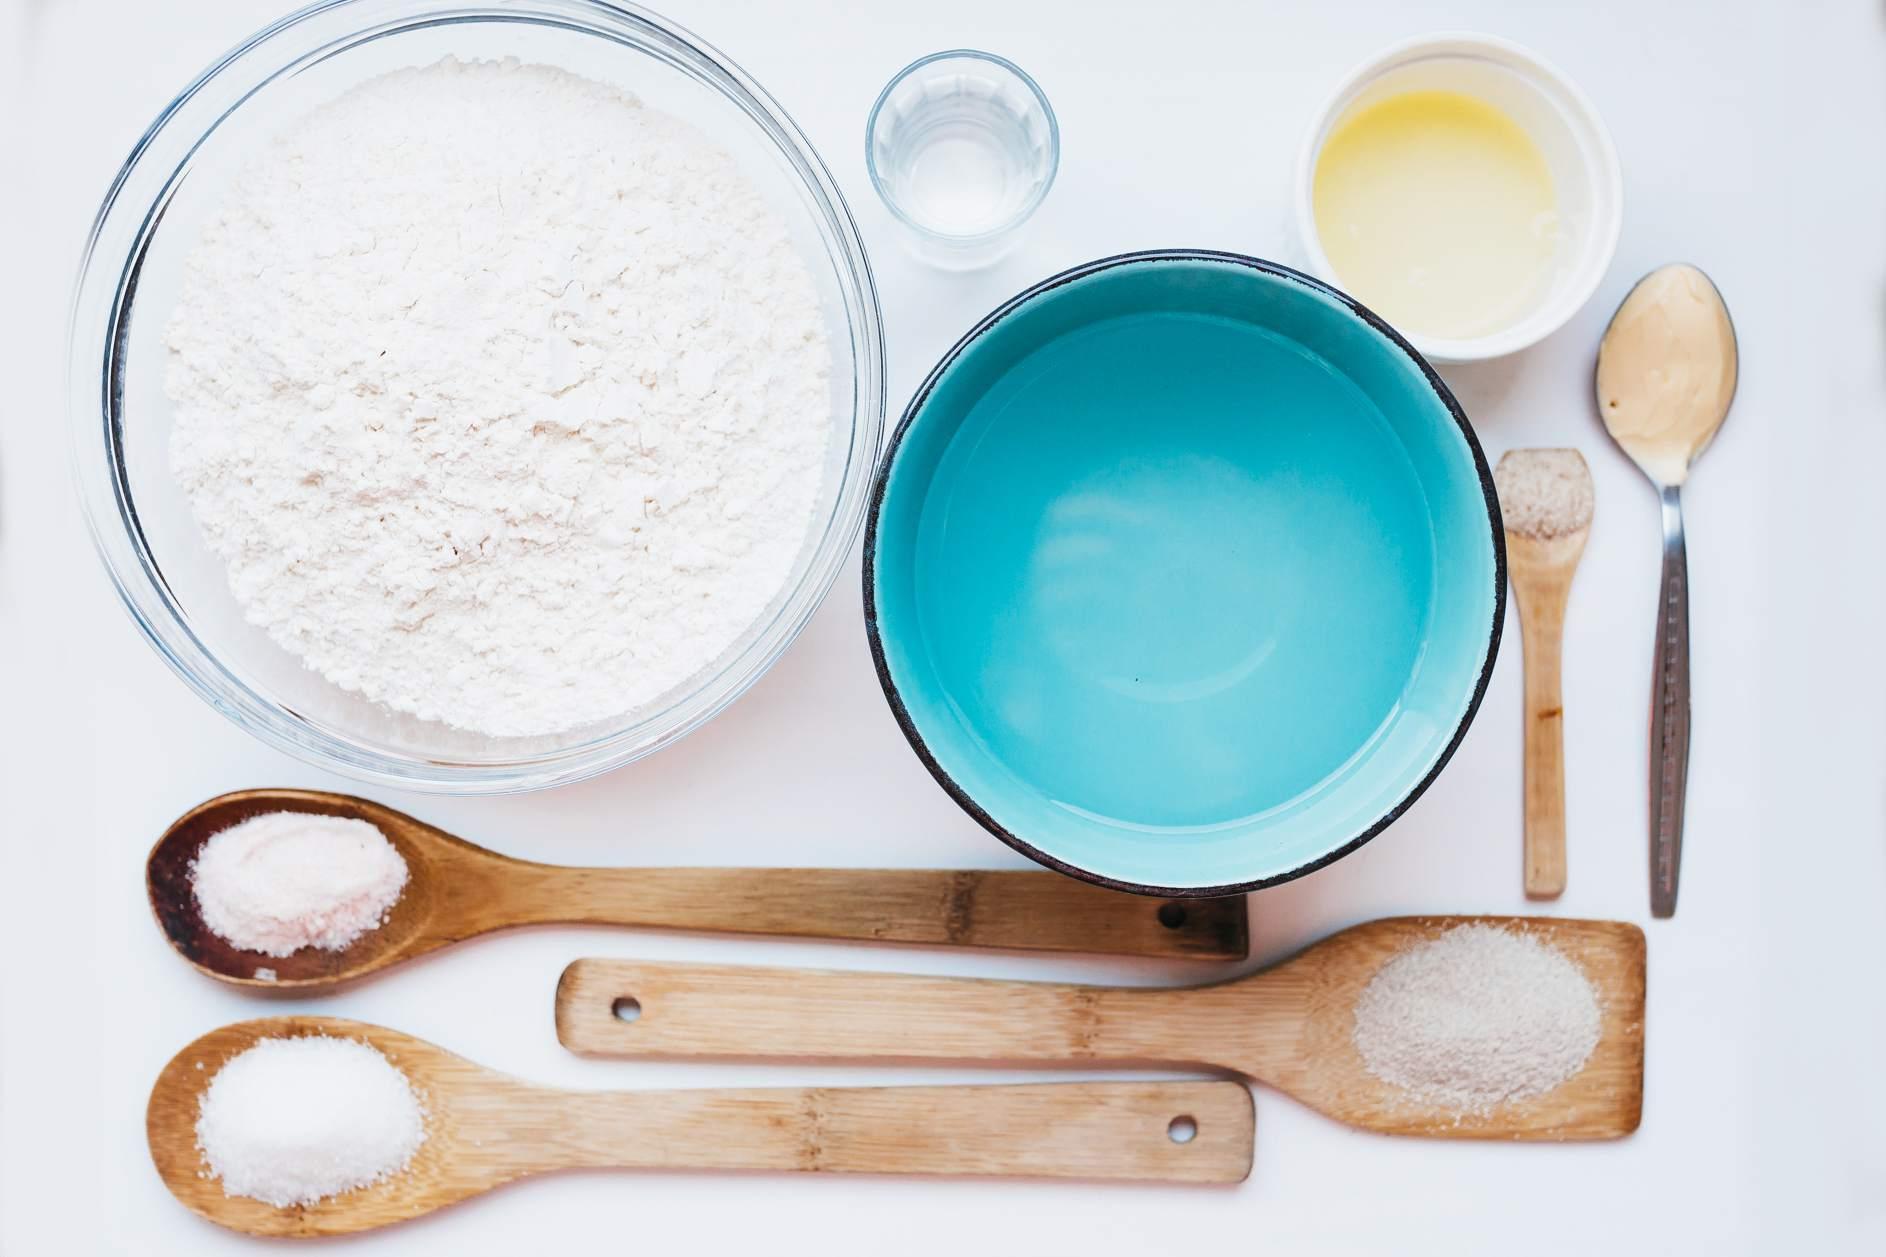 Ingredients for Italian bread dough